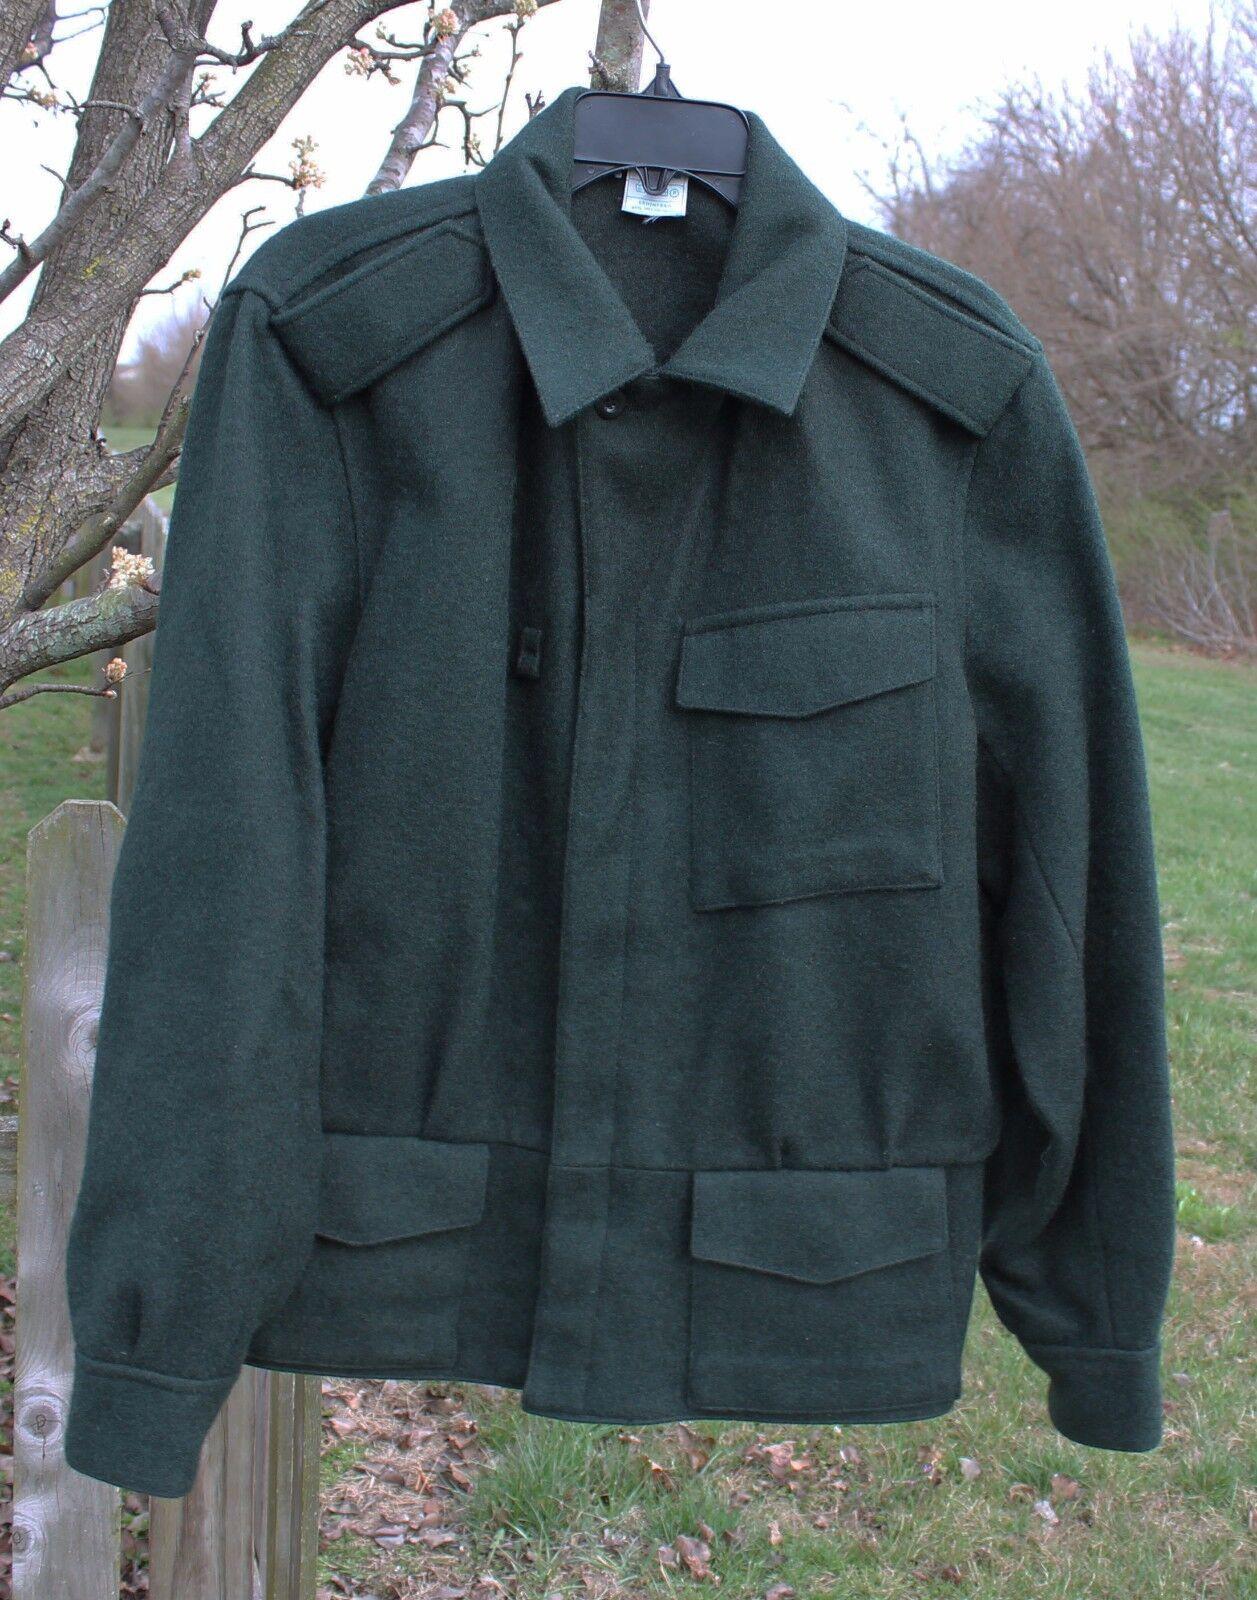 VTG Wool Loden Grün Finnish Finland Military Hunting Coat  Herren Größe Small